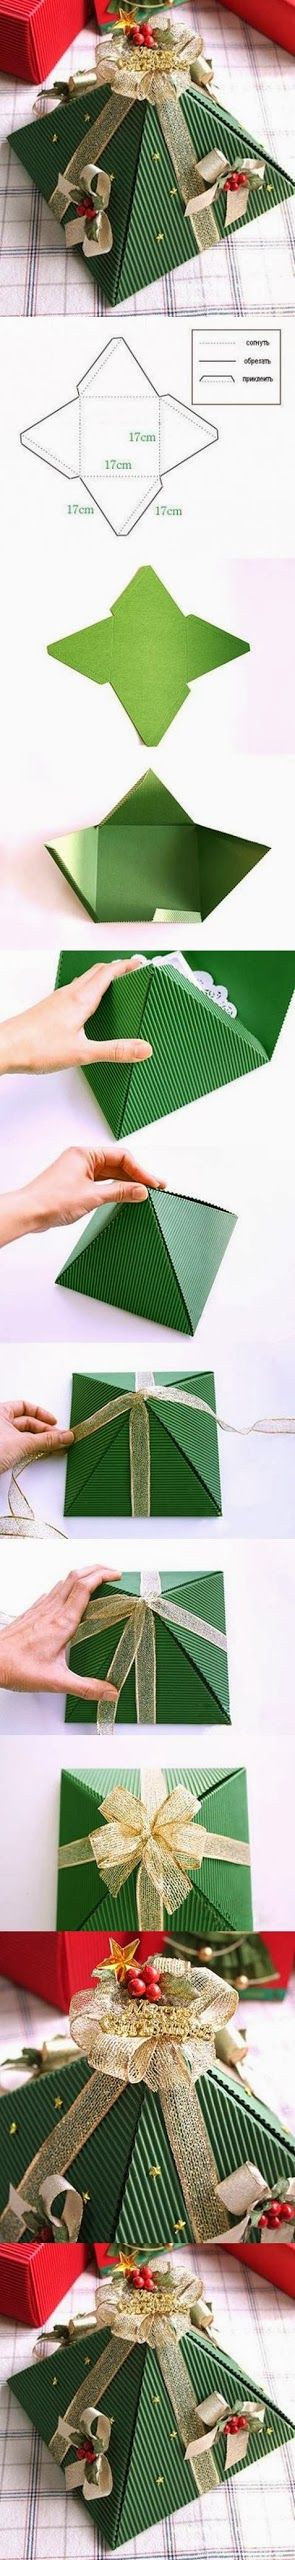 DIY : Pyramid Christmas Box | DIY & Crafts Tutorials